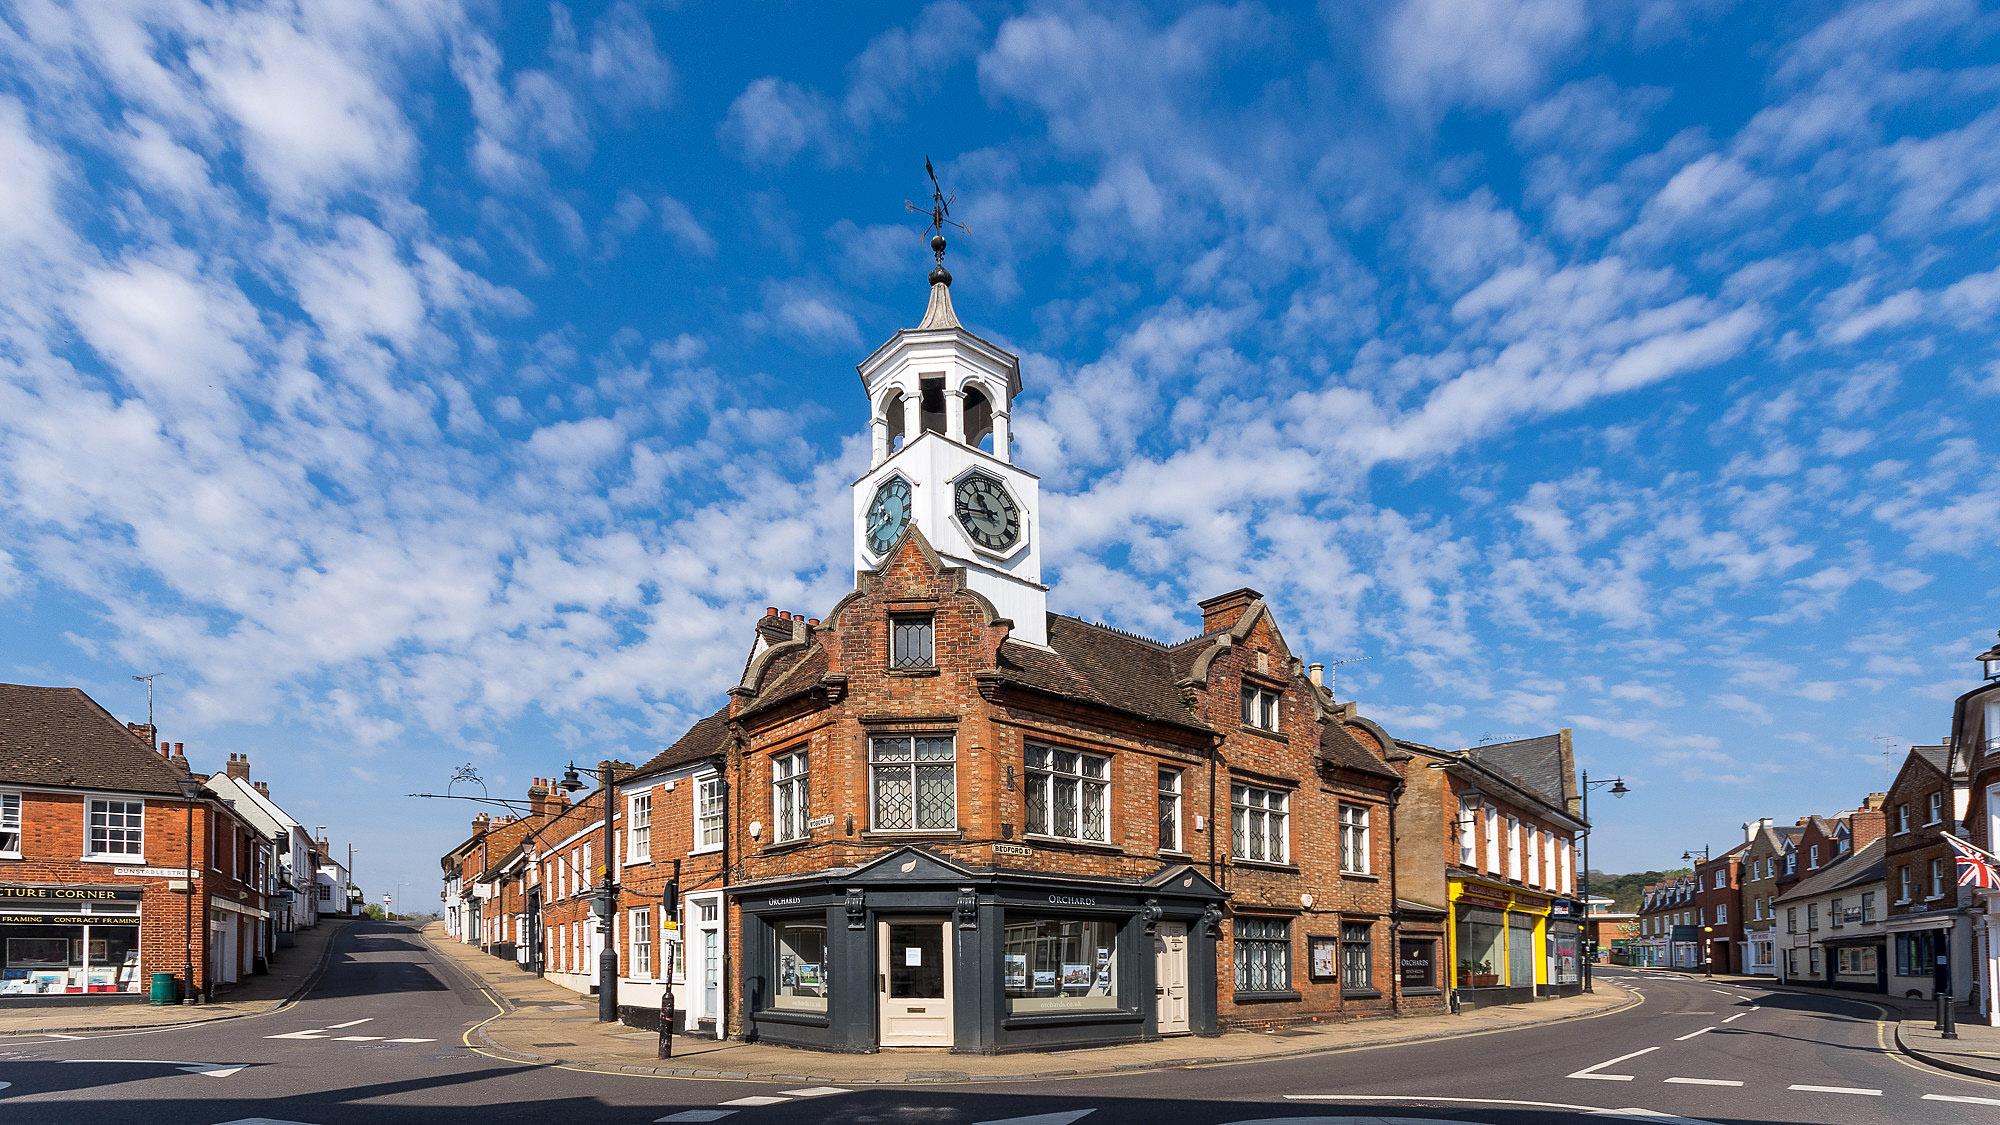 Ampthill, Bedfordshire 2 by Ken Barley.jpg